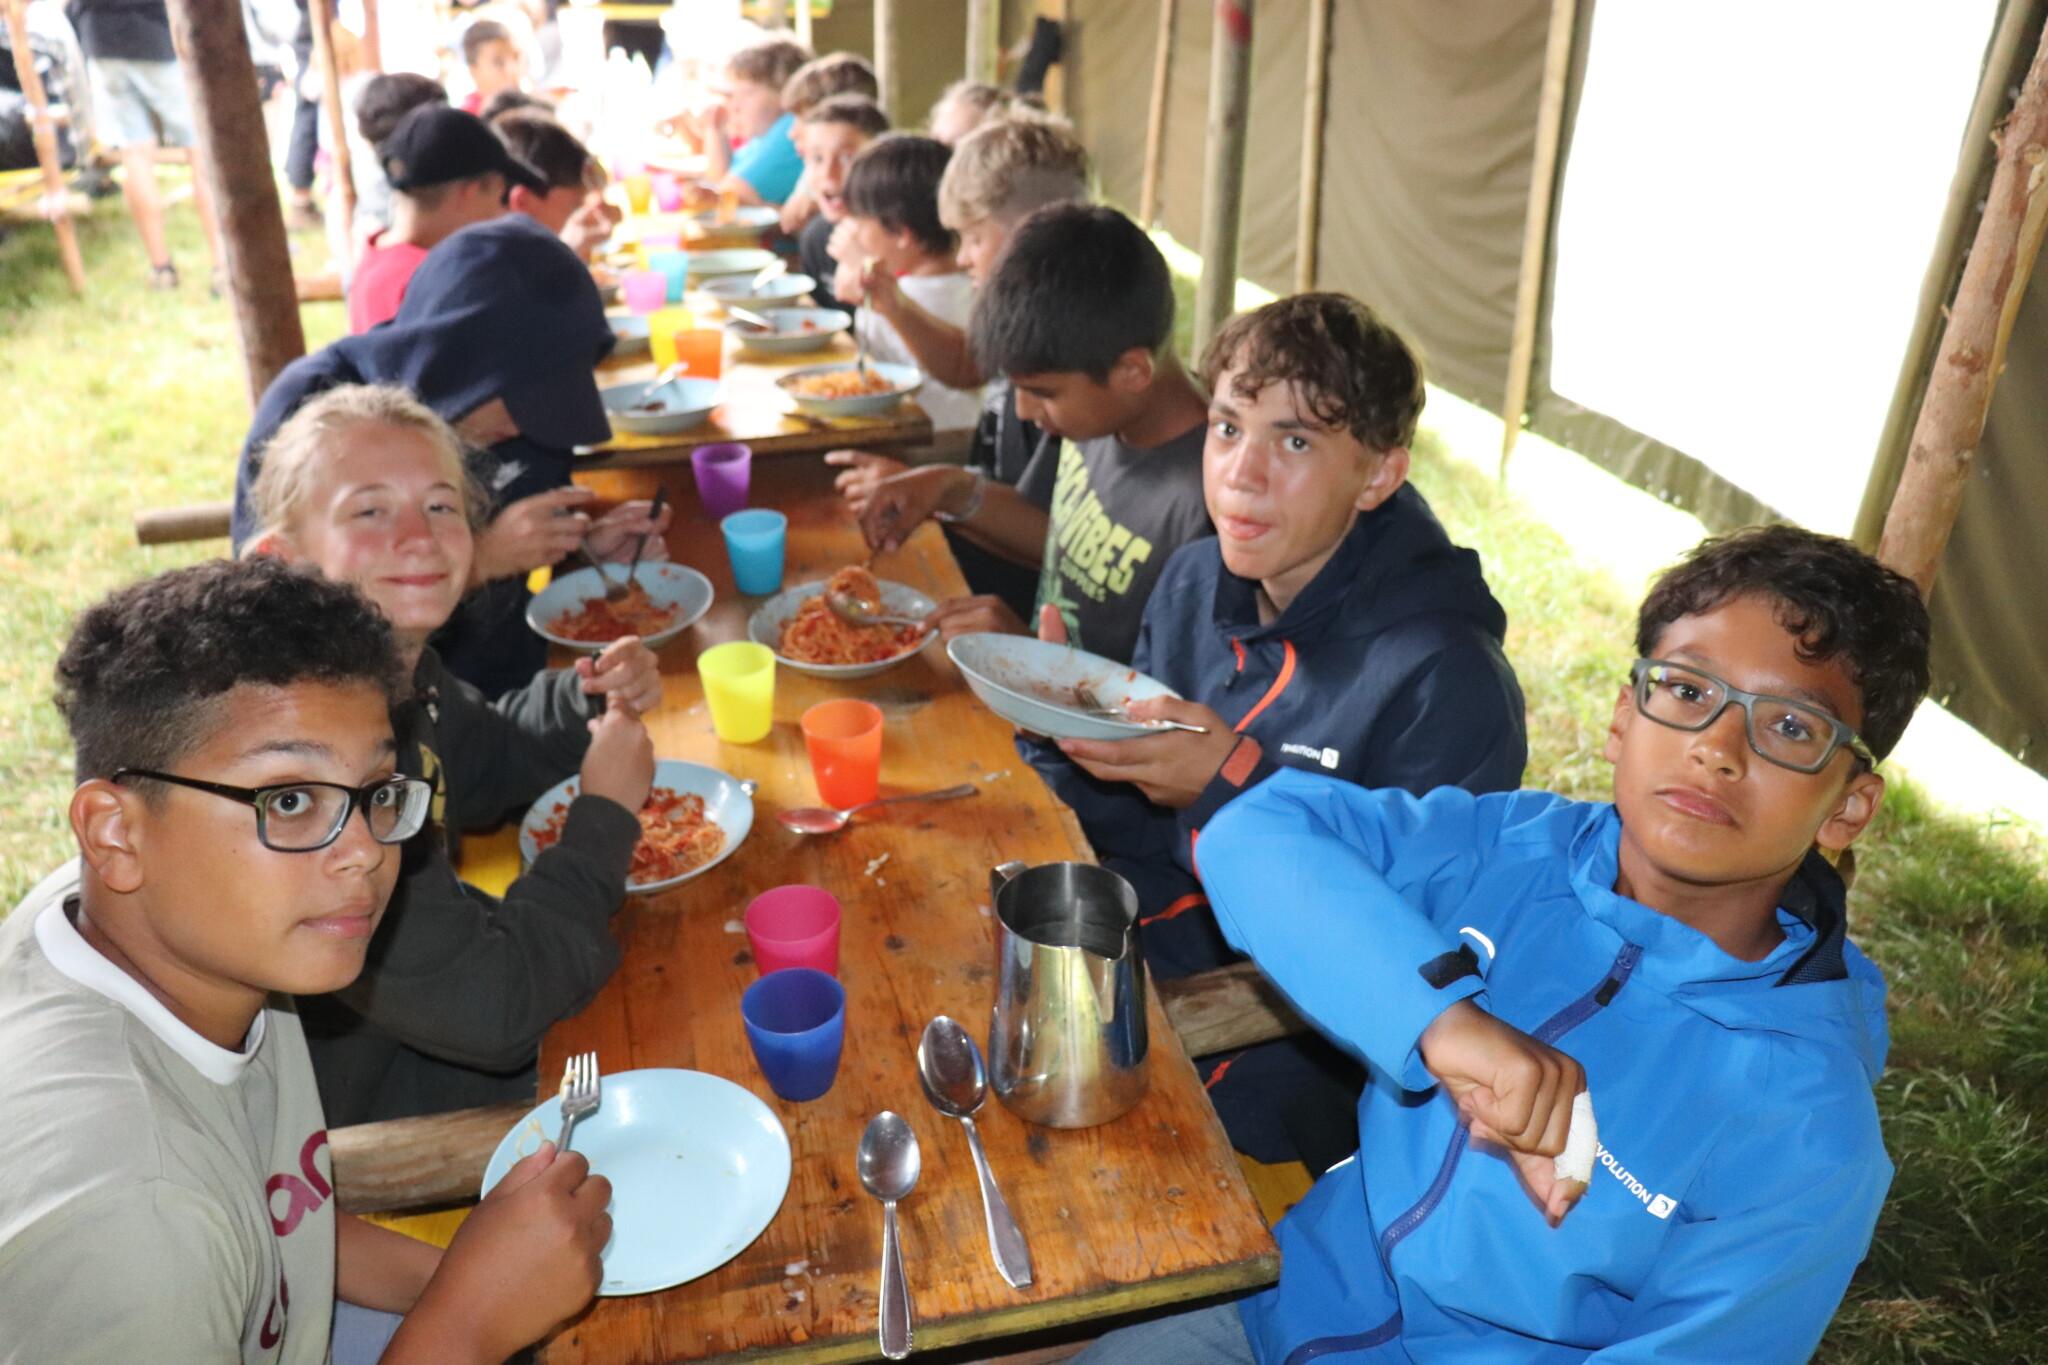 2019-07-06 17.13.48 SOLA 2019 - Pippi Langstrumpf - Cannon Uluru